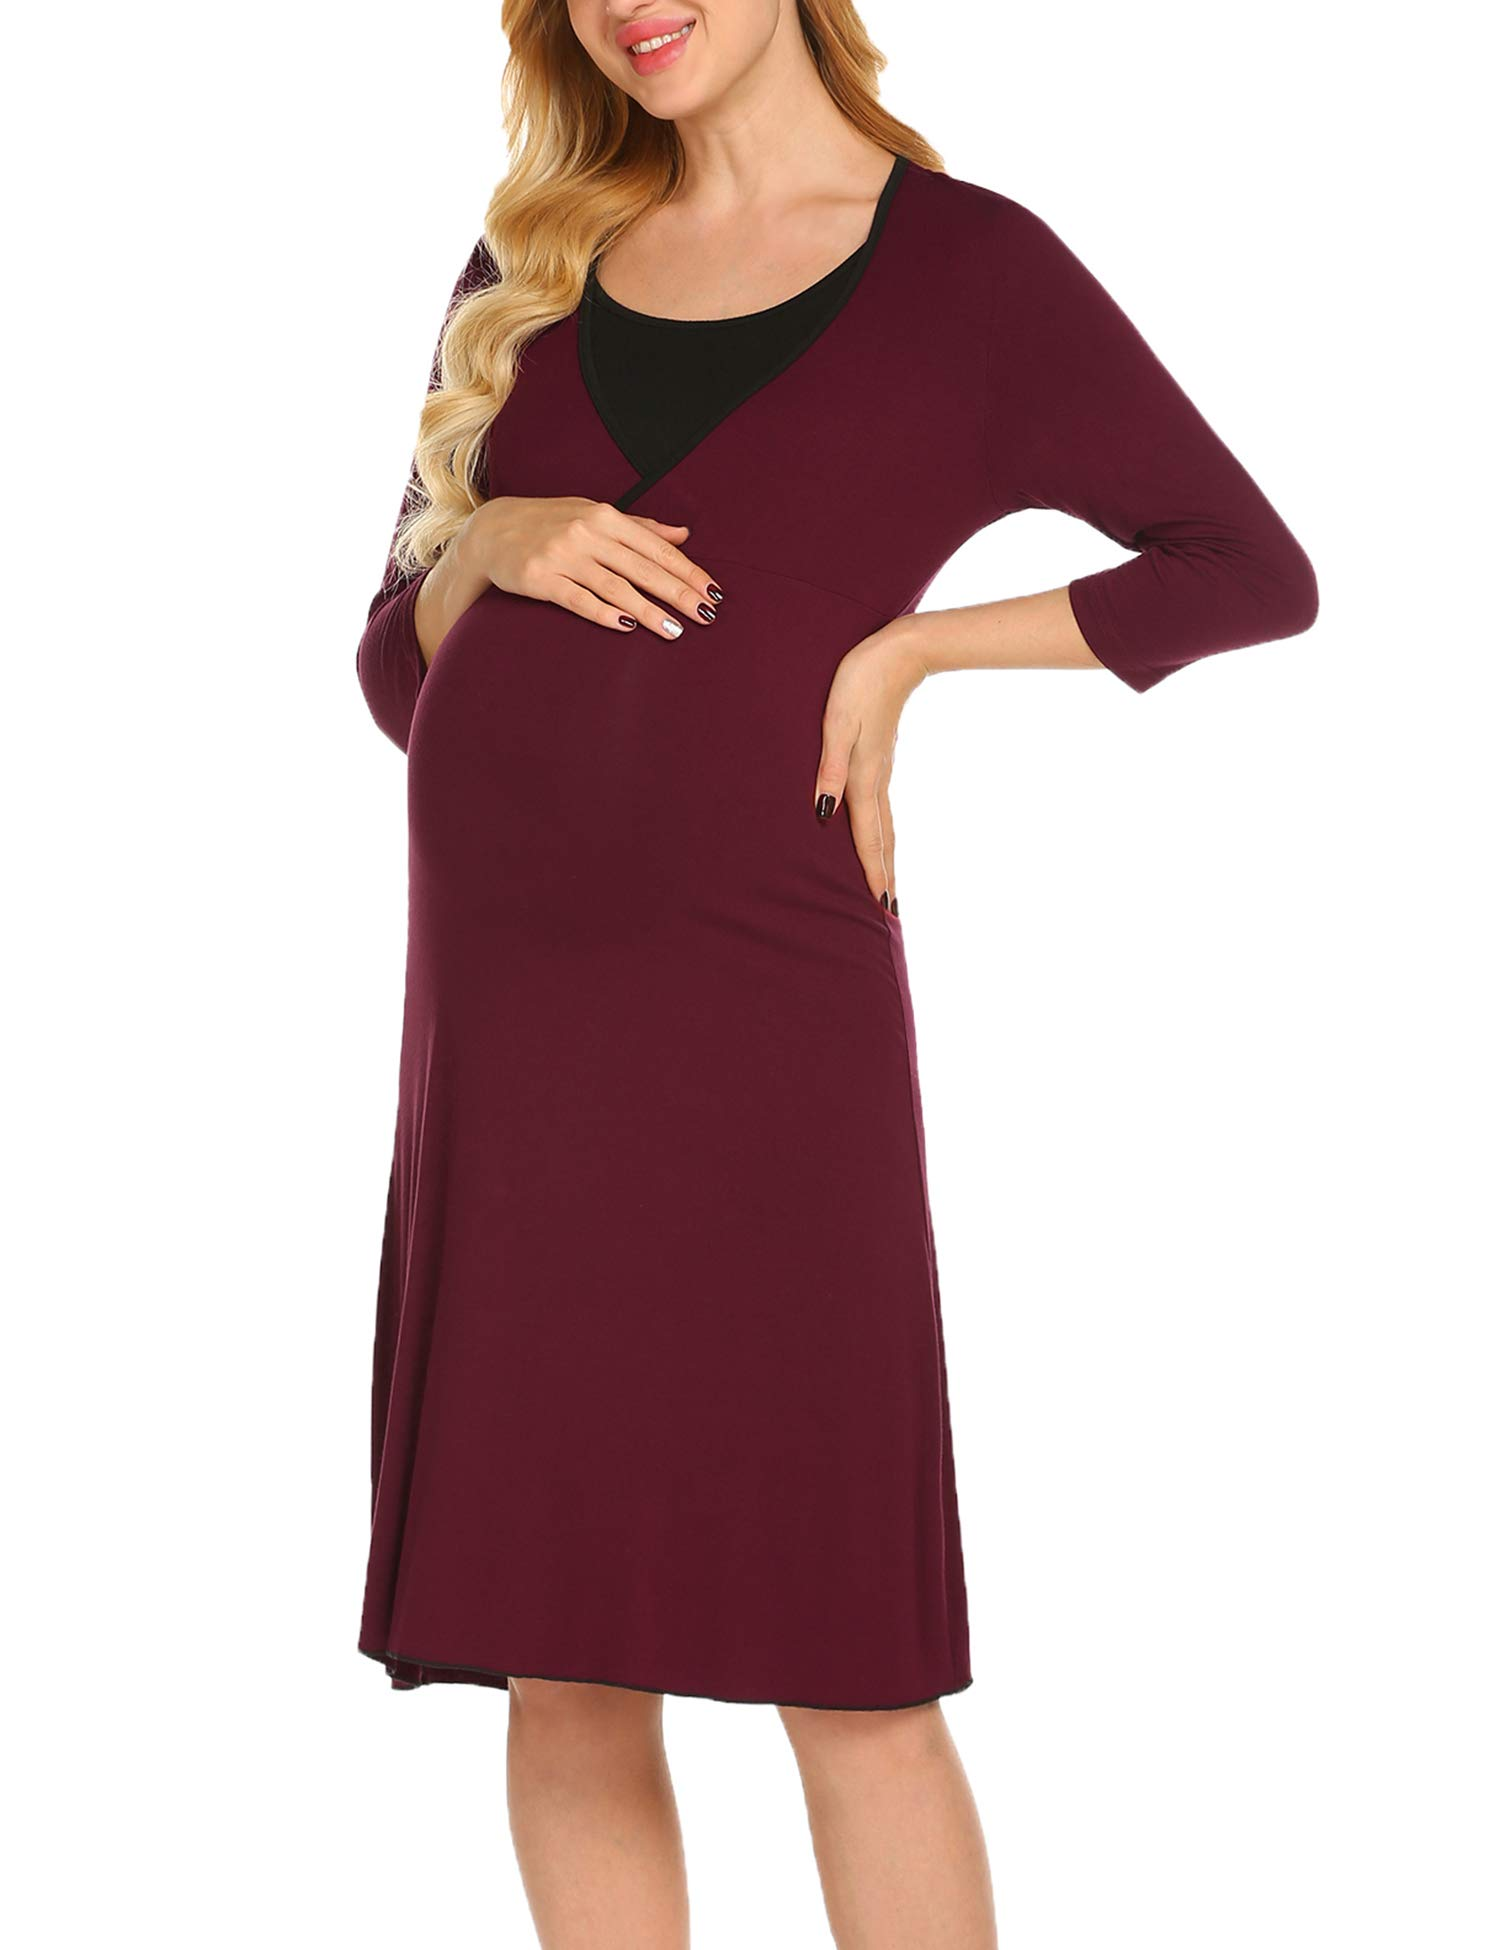 Ekouaer Maternity Nursing Dress Womens Casual 3/4 Sleeve Breastfeeding Nightgown S-XXL